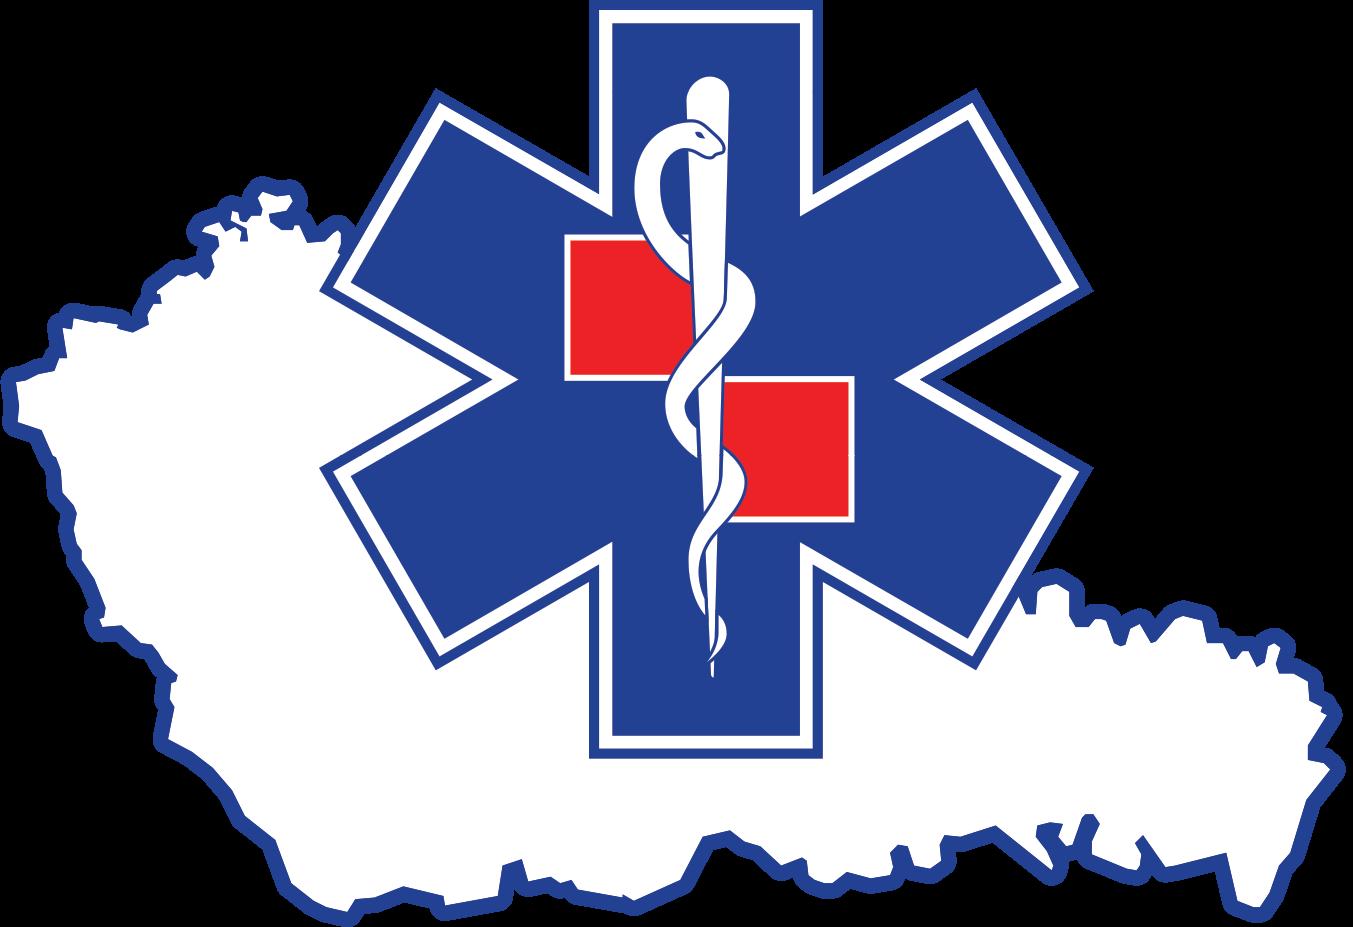 ZHMMZ_logo